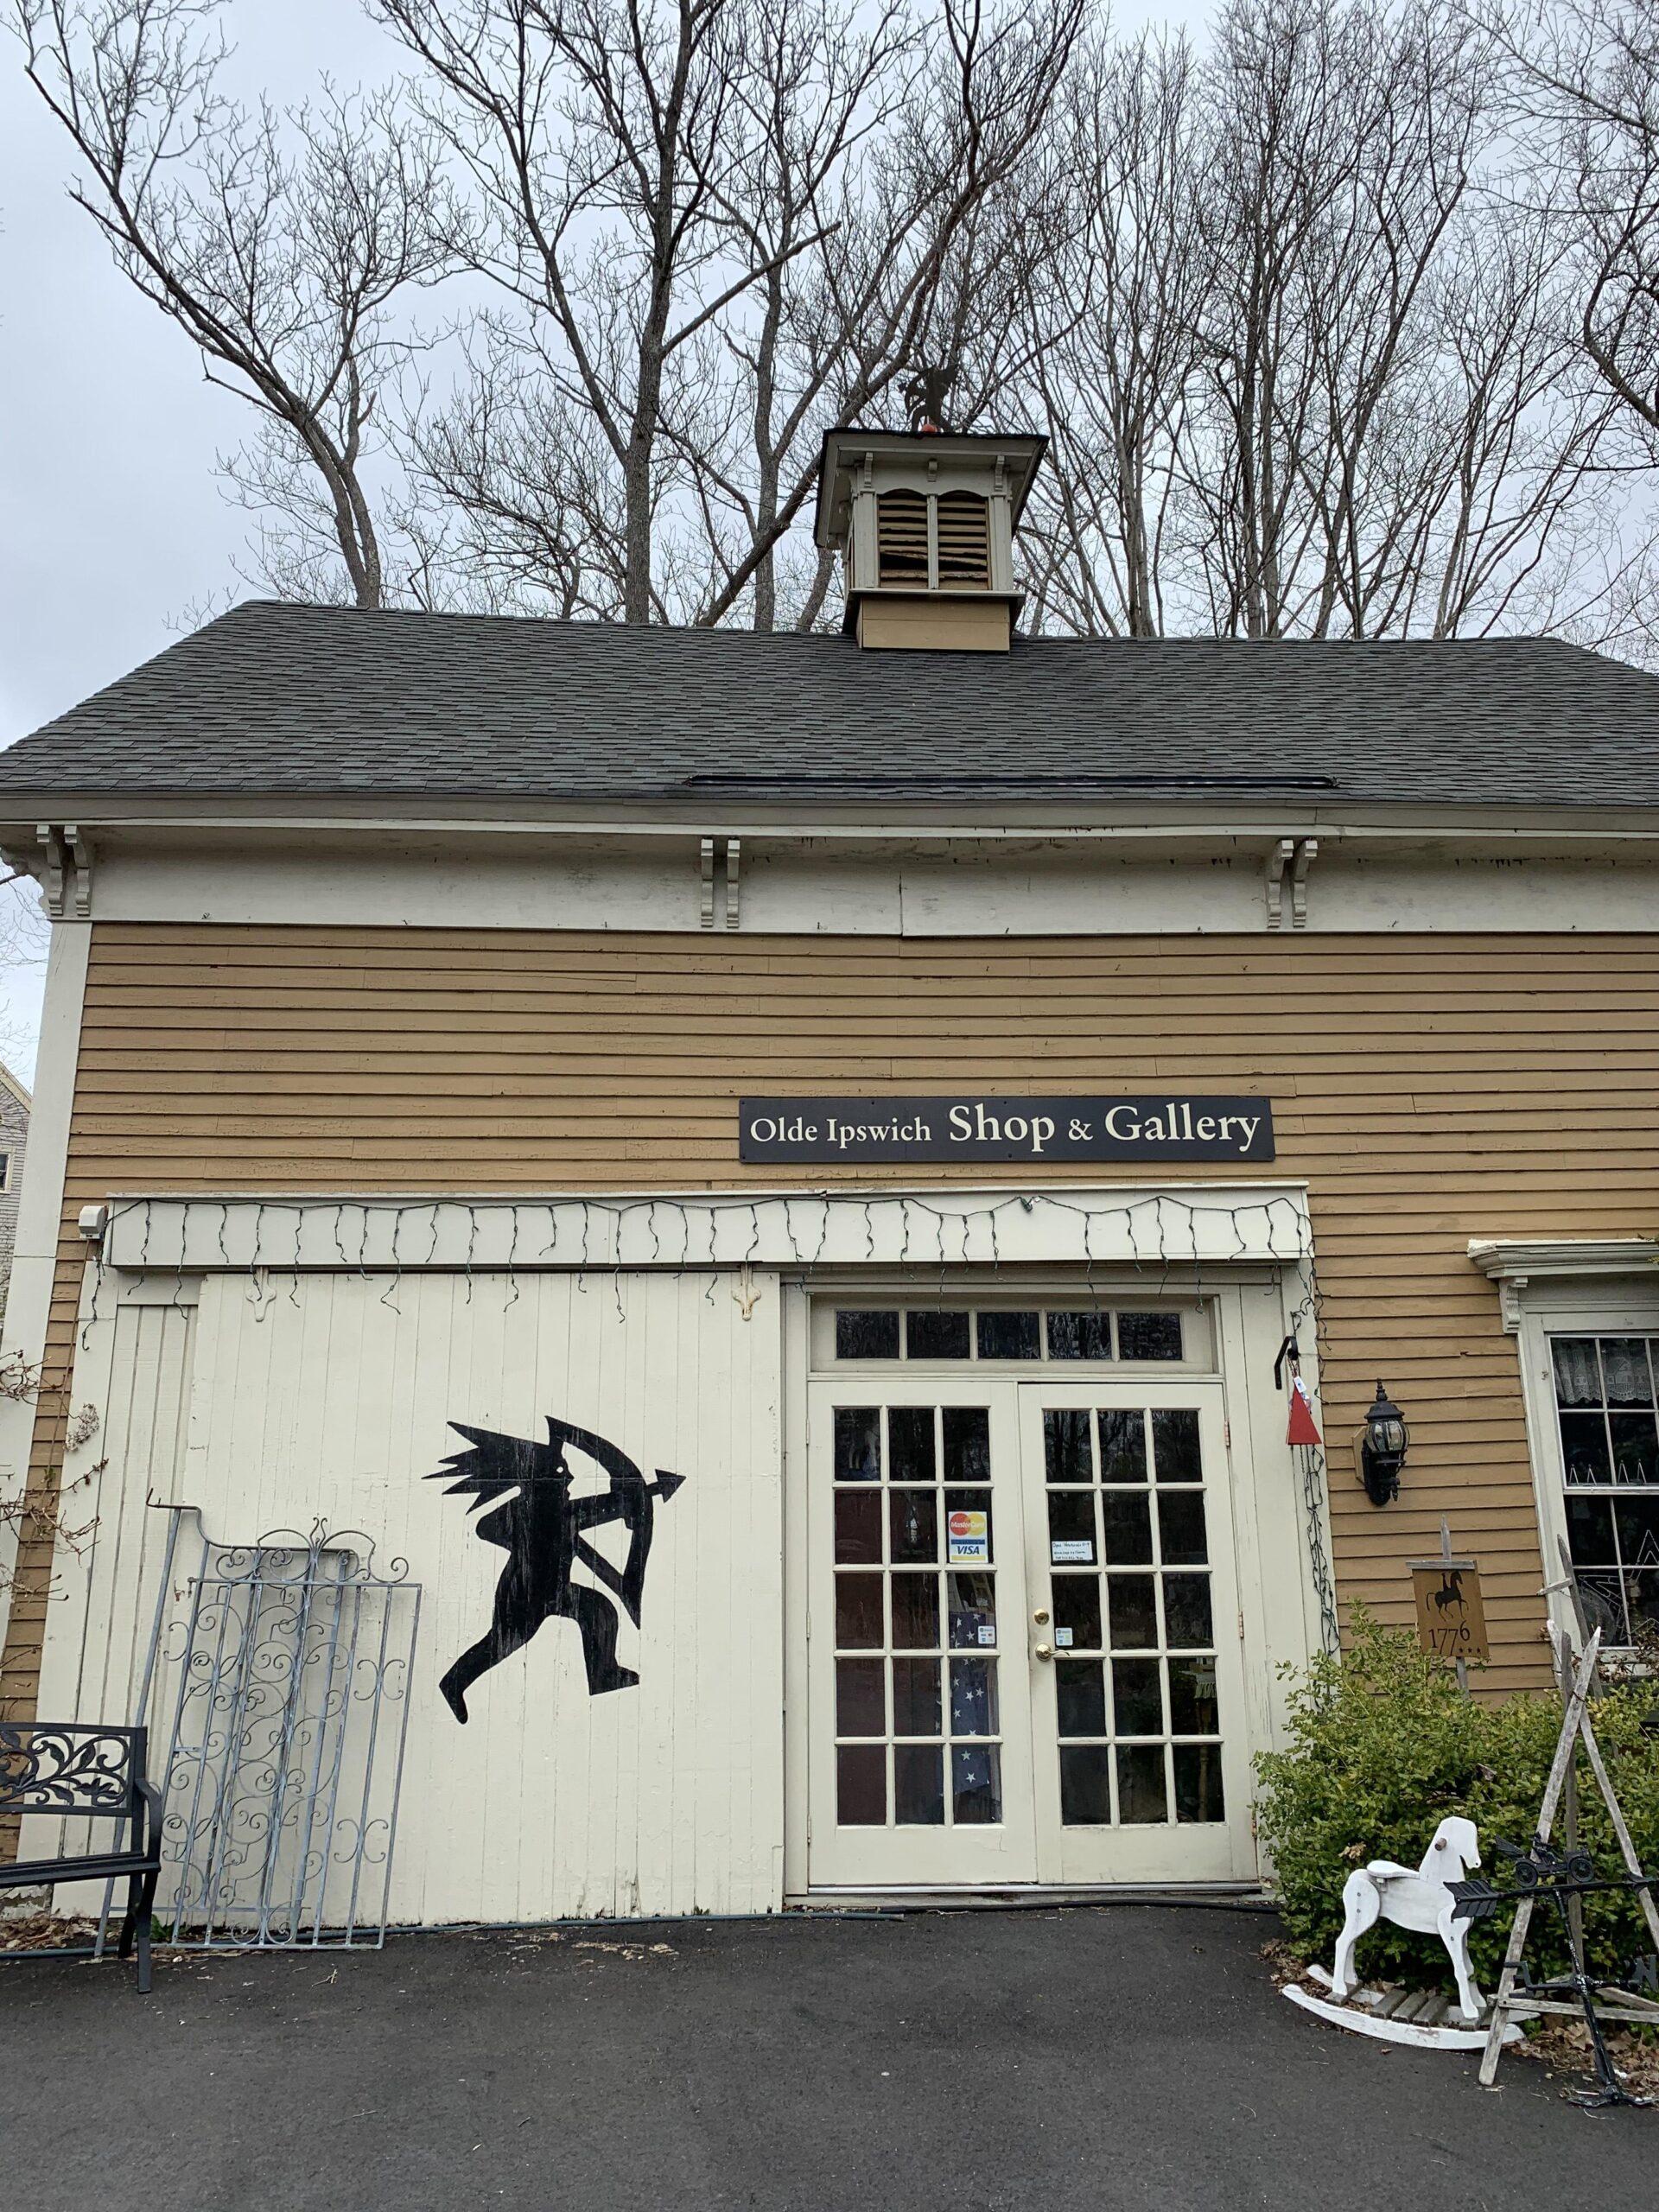 Olde Ipswich Shop & Gallery